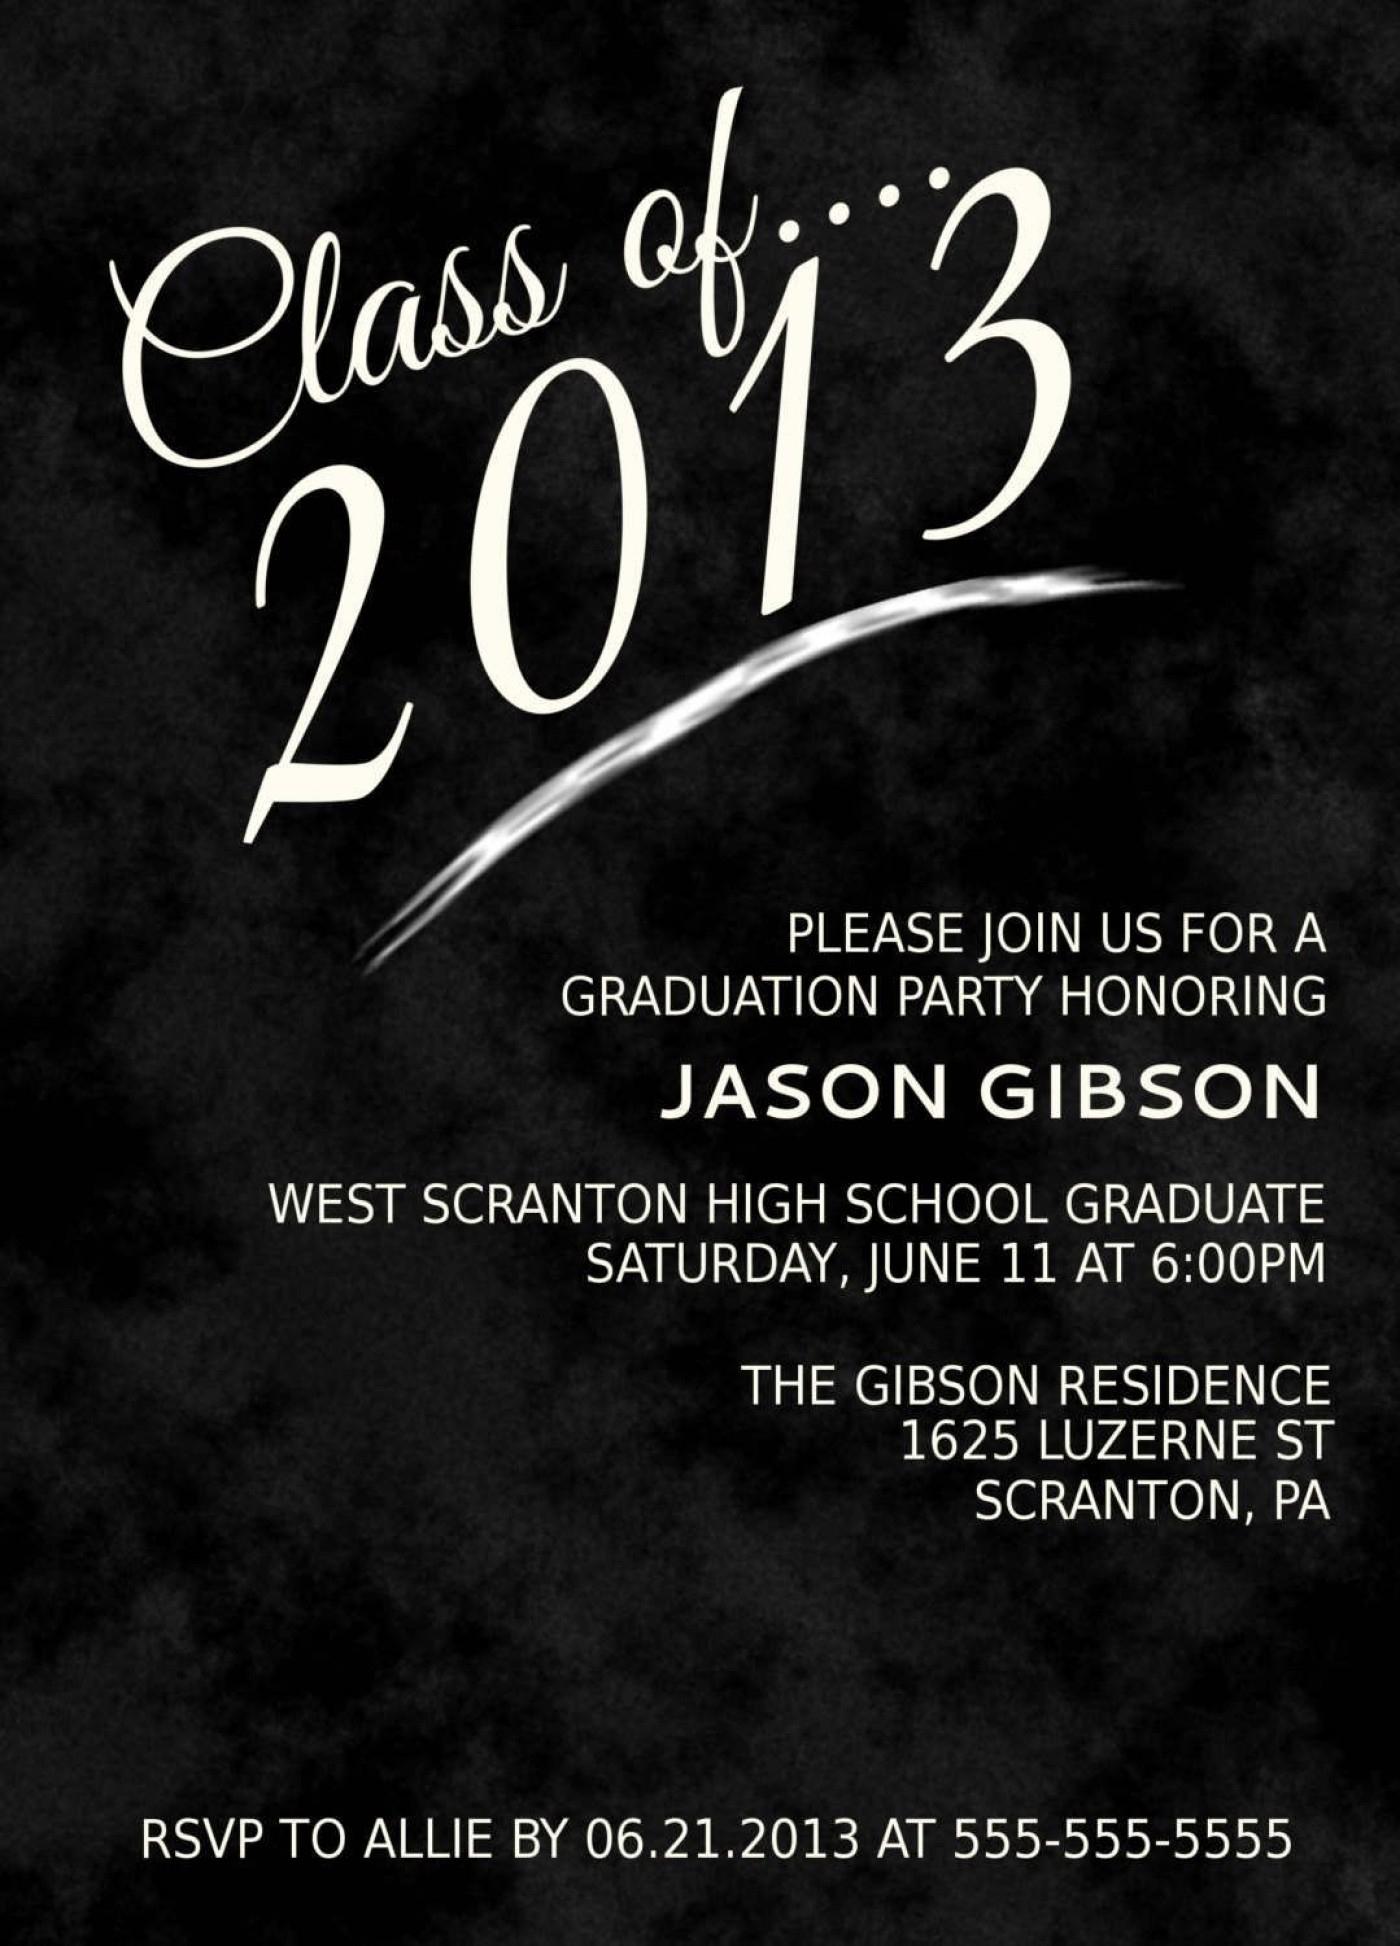 016 Free Printable Graduation Announcement Template Preschool - Free Printable Graduation Invitations 2014